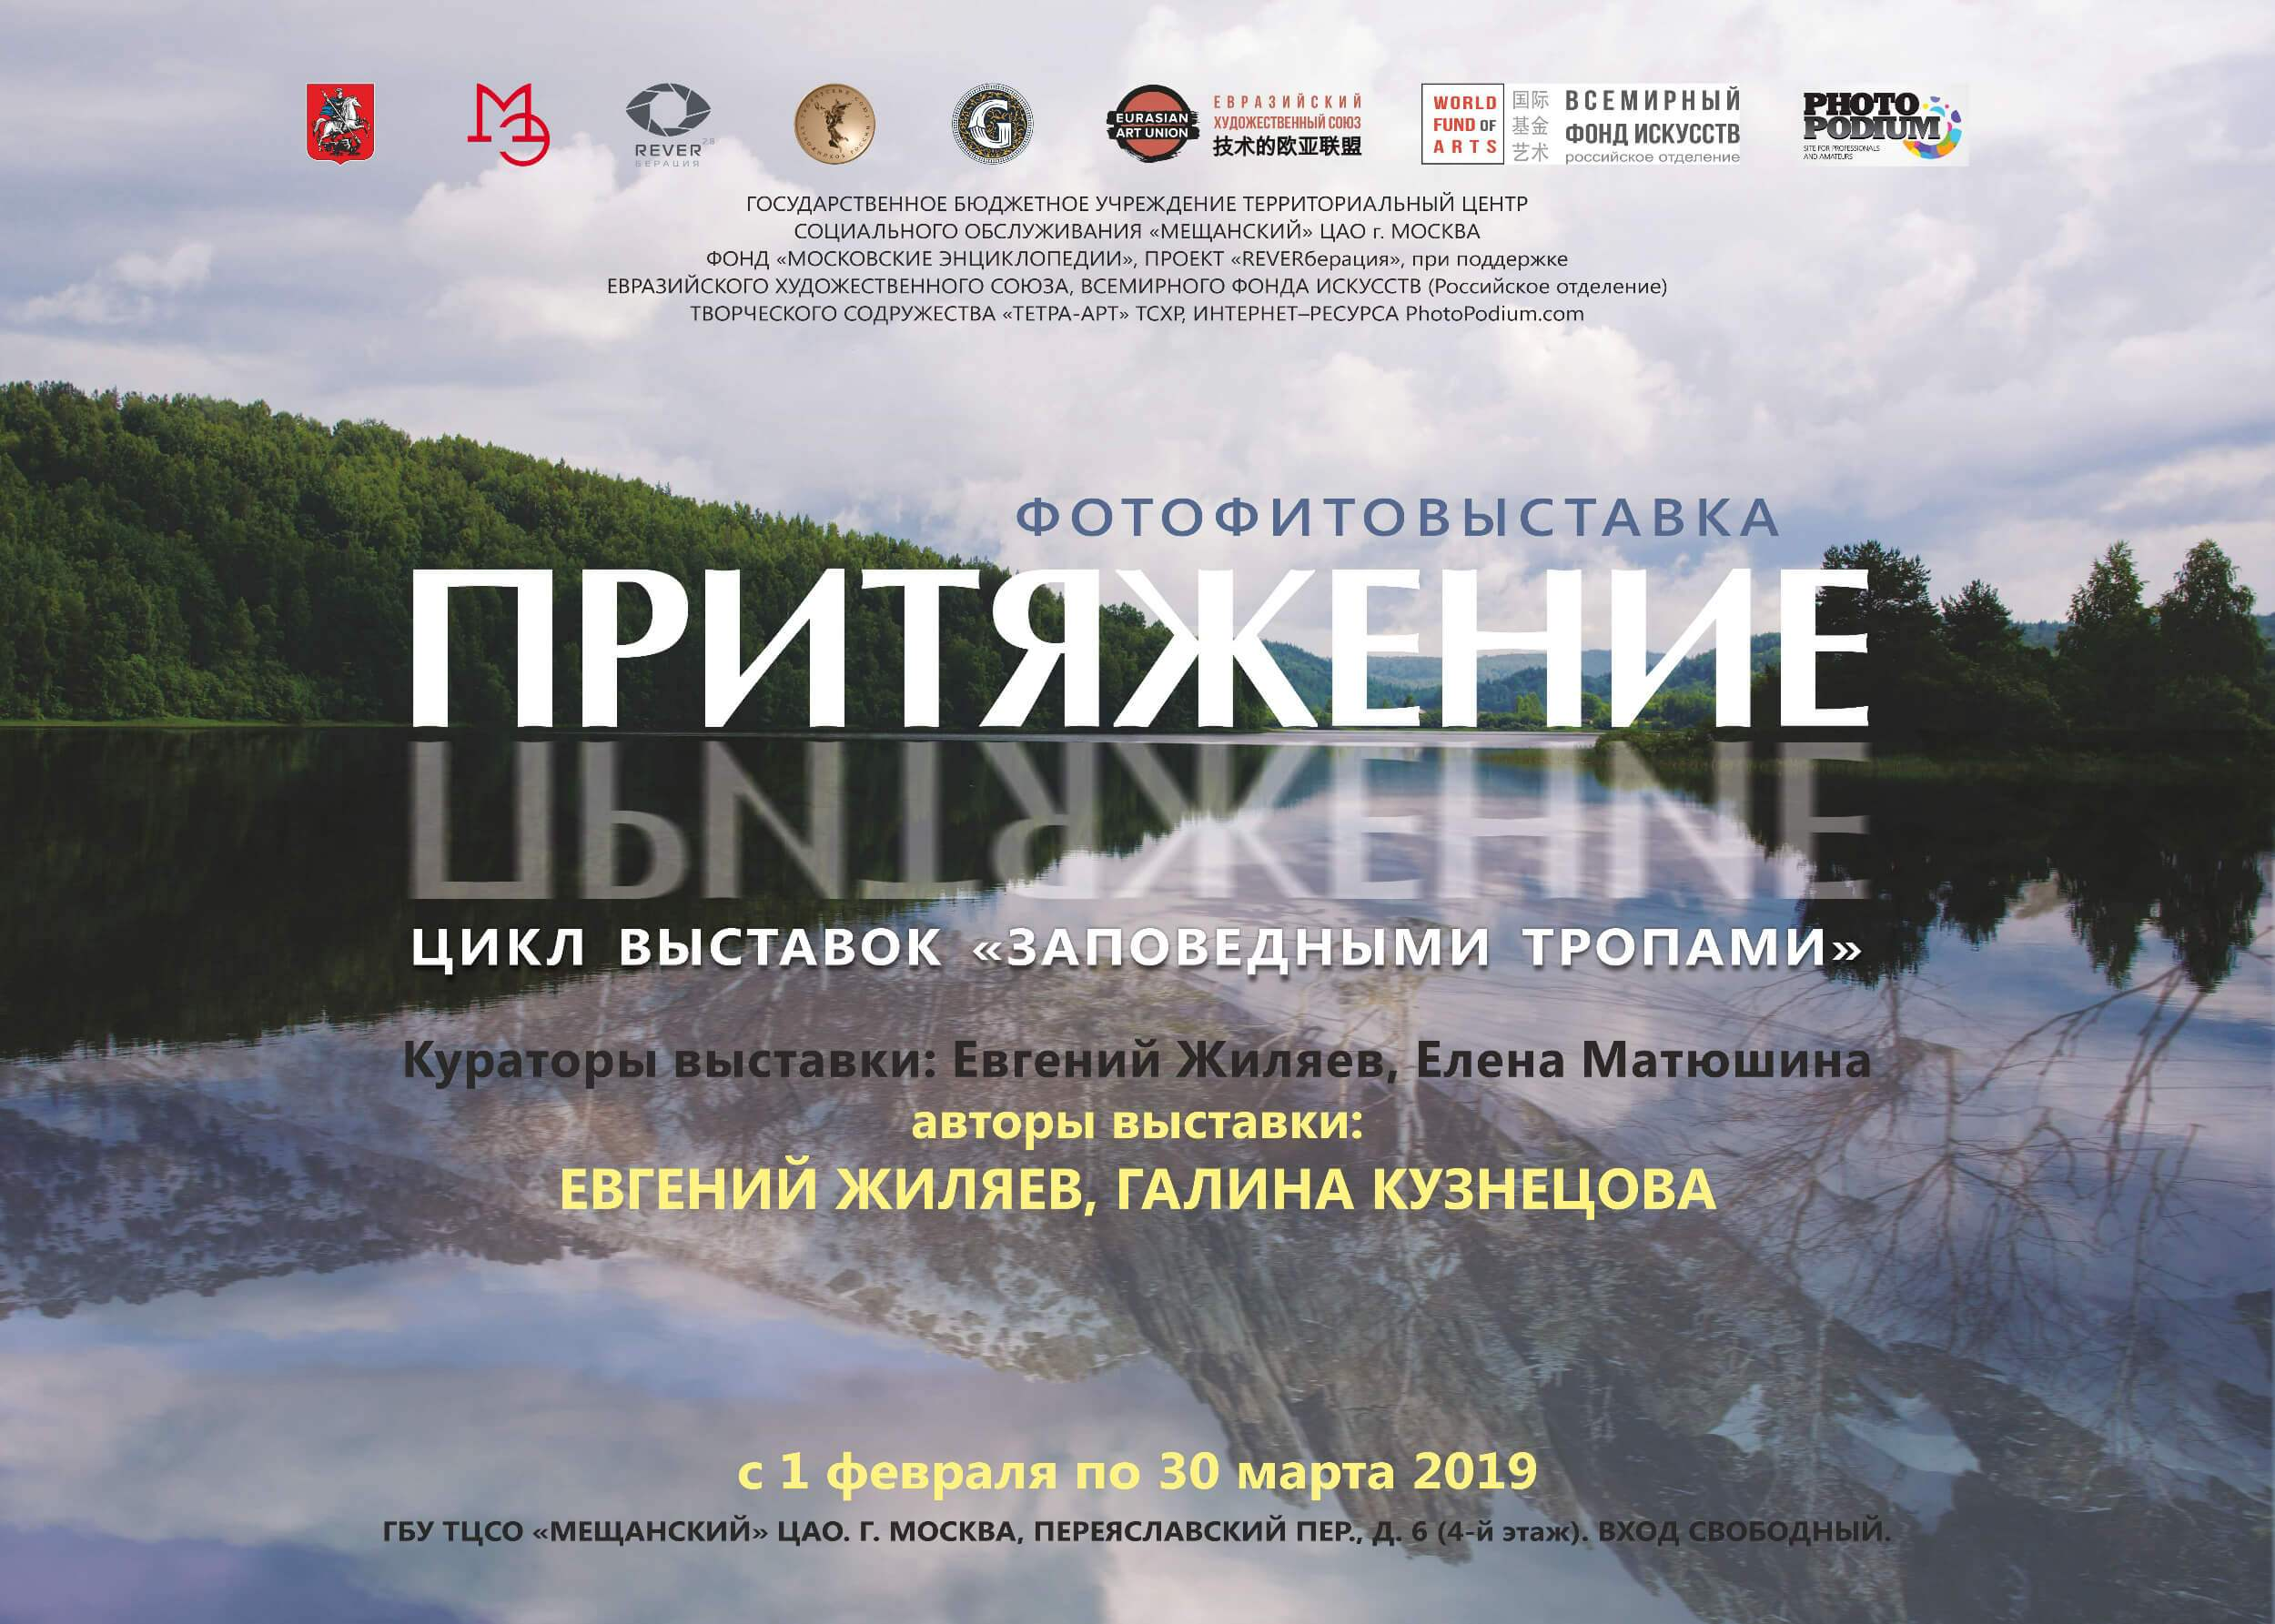 "Photo exhibition by Evgenia Zhilyaeva and Galina Kuznetsova ""Attraction"""